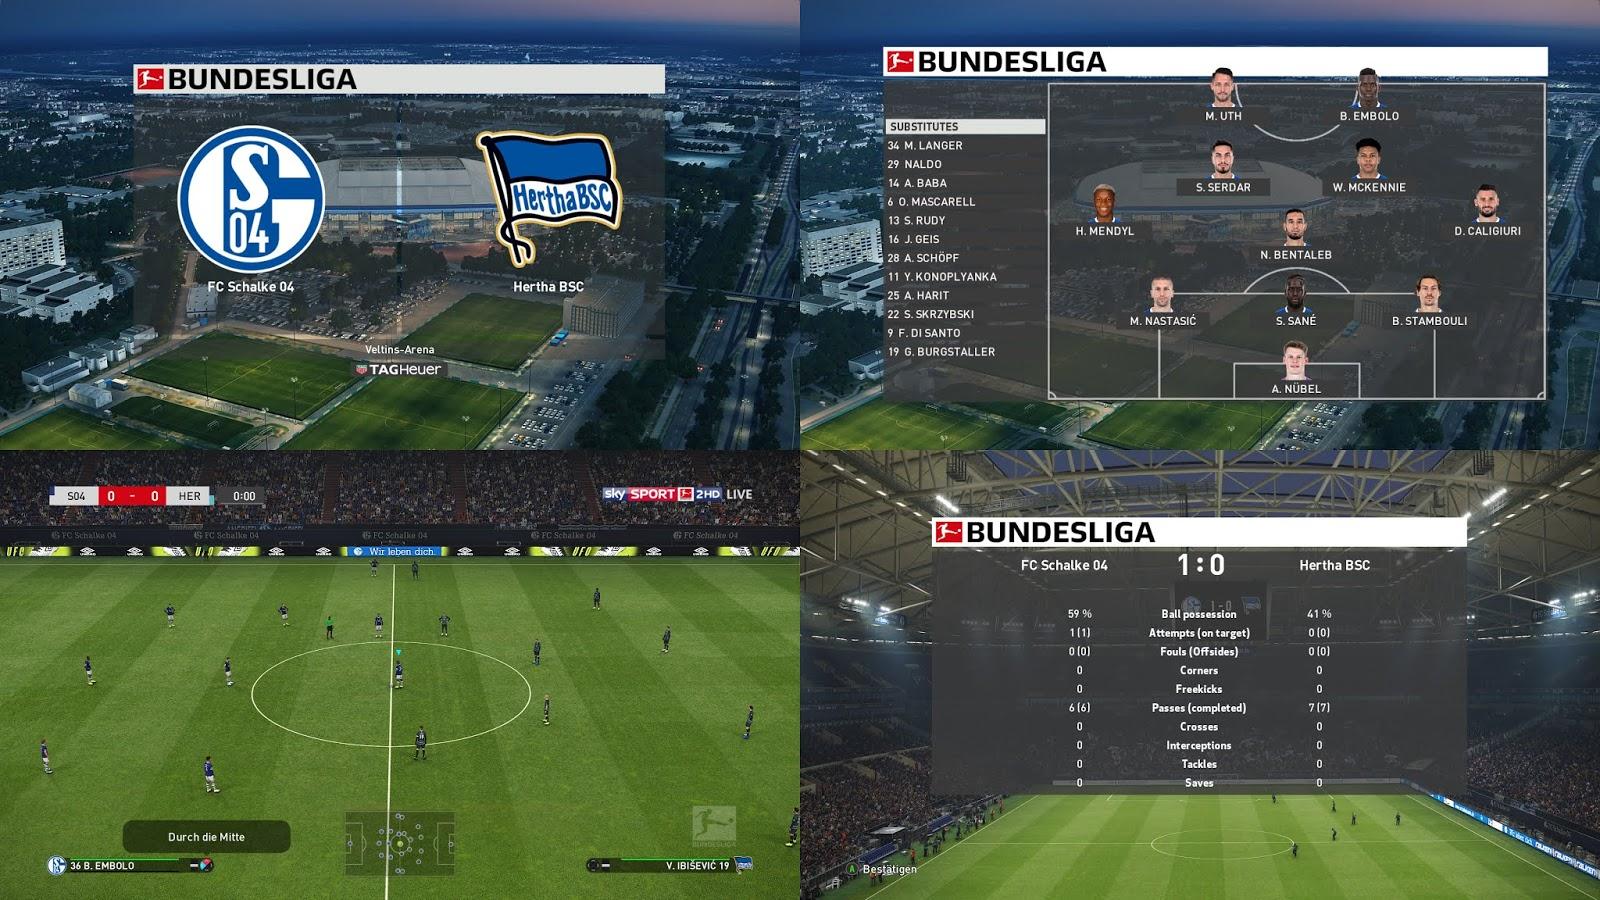 PES 2019 German Scoreboards (Bundesliga + DFB-Pokal + DFL-Supercup) by 1002MB